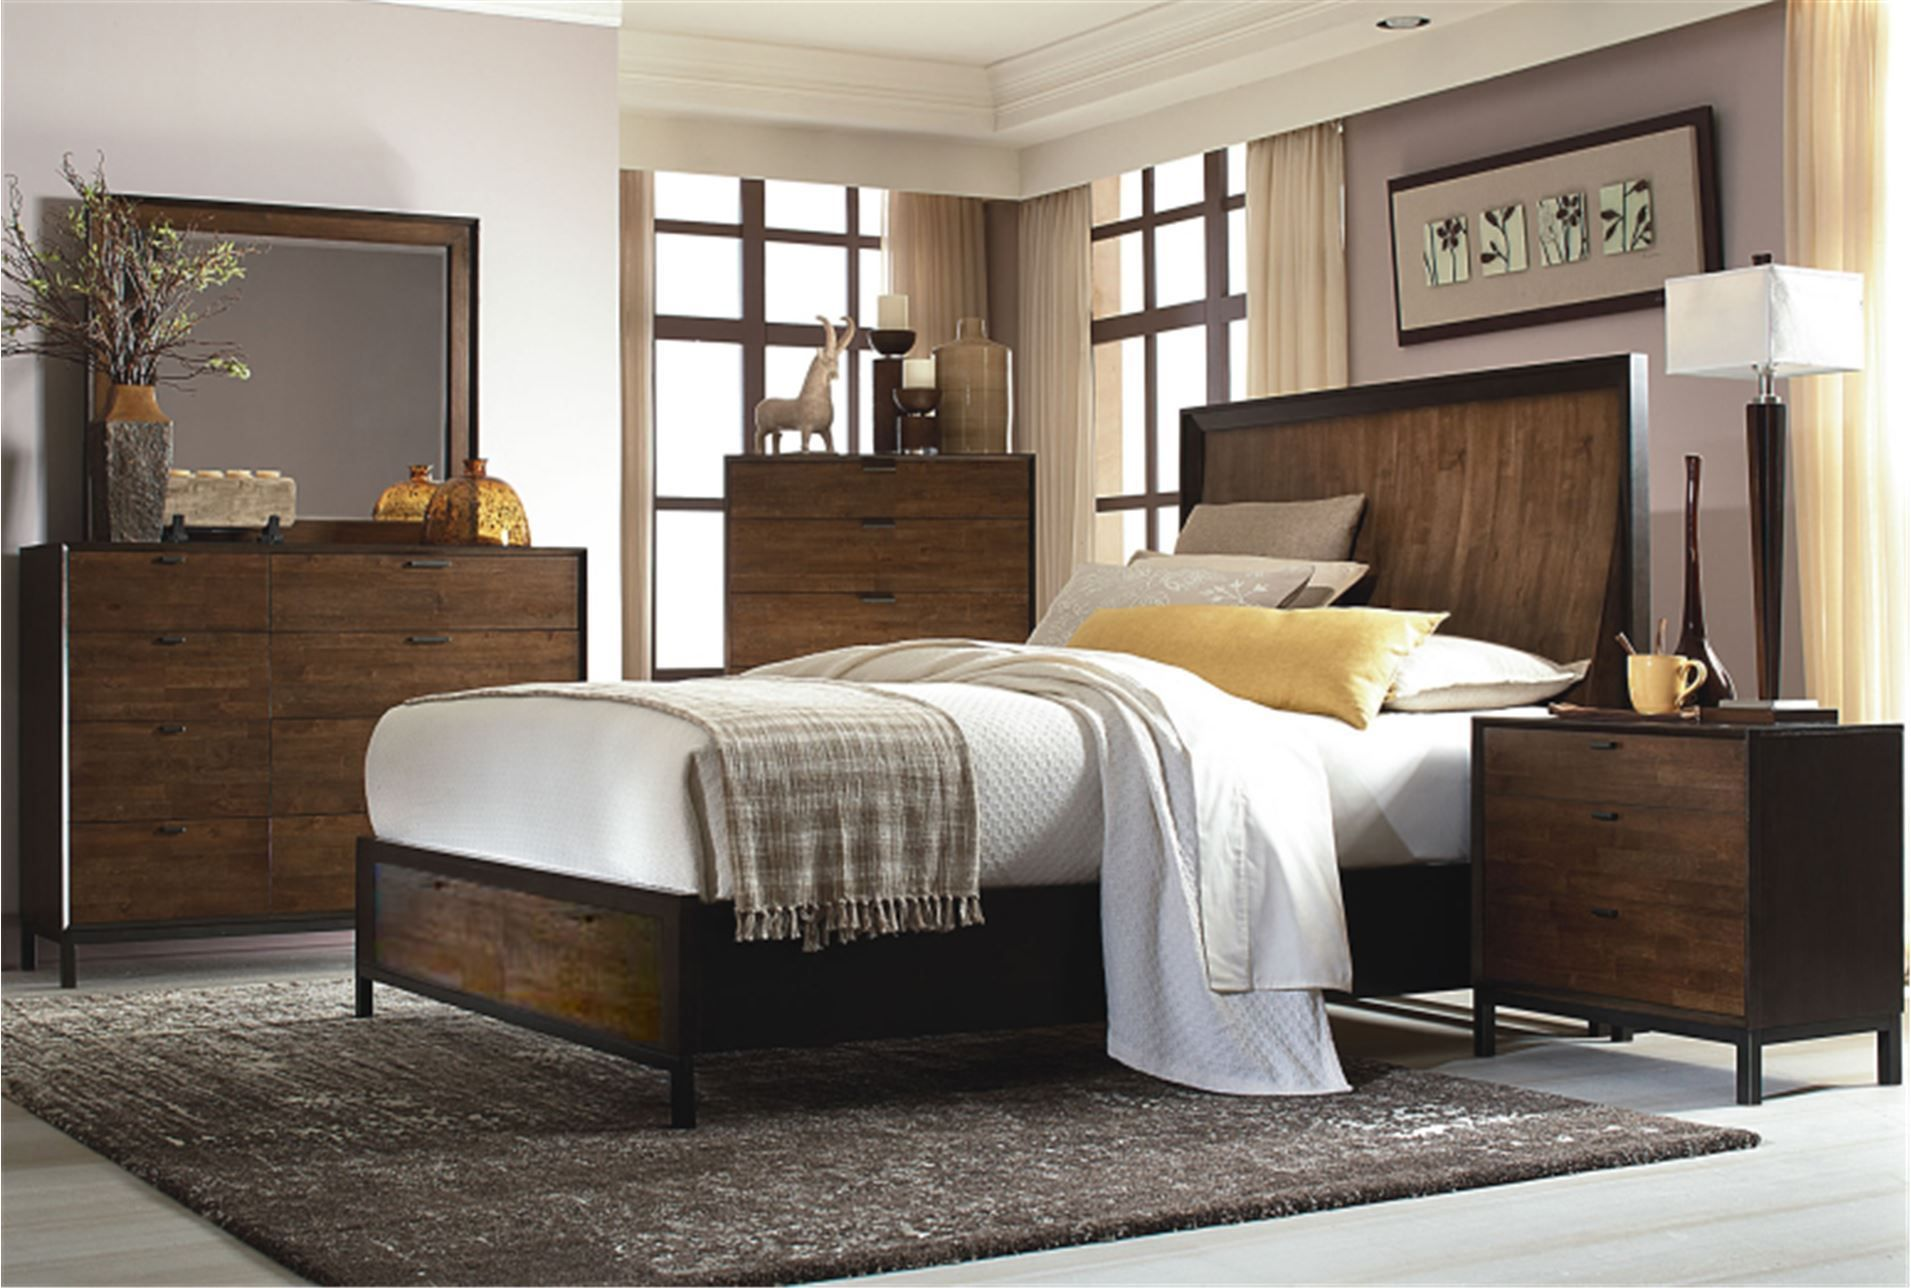 Moro Queen Storage Bed Affordable Bedroom Furniture Bedroom